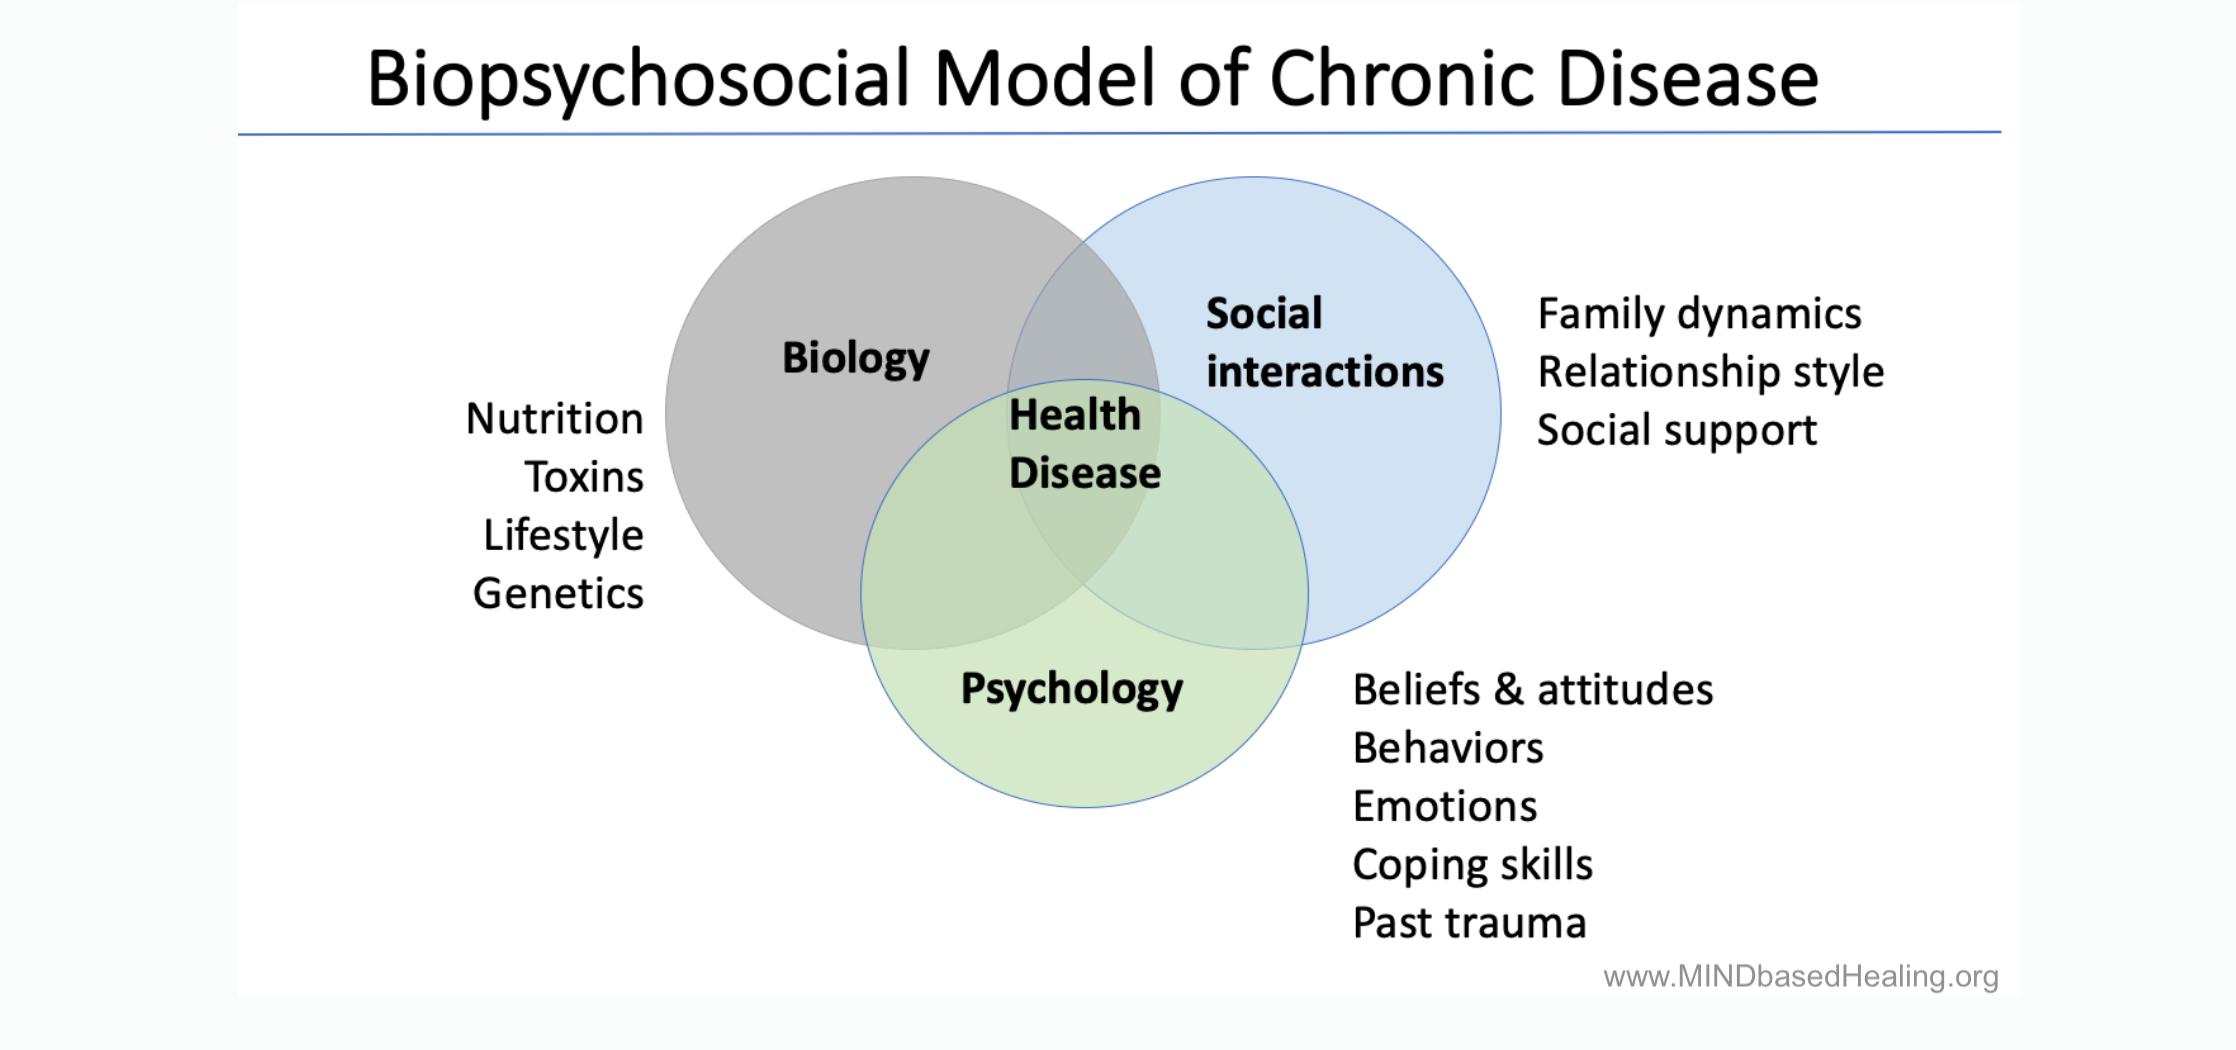 biopsychosocial-model-of-chronic-disease